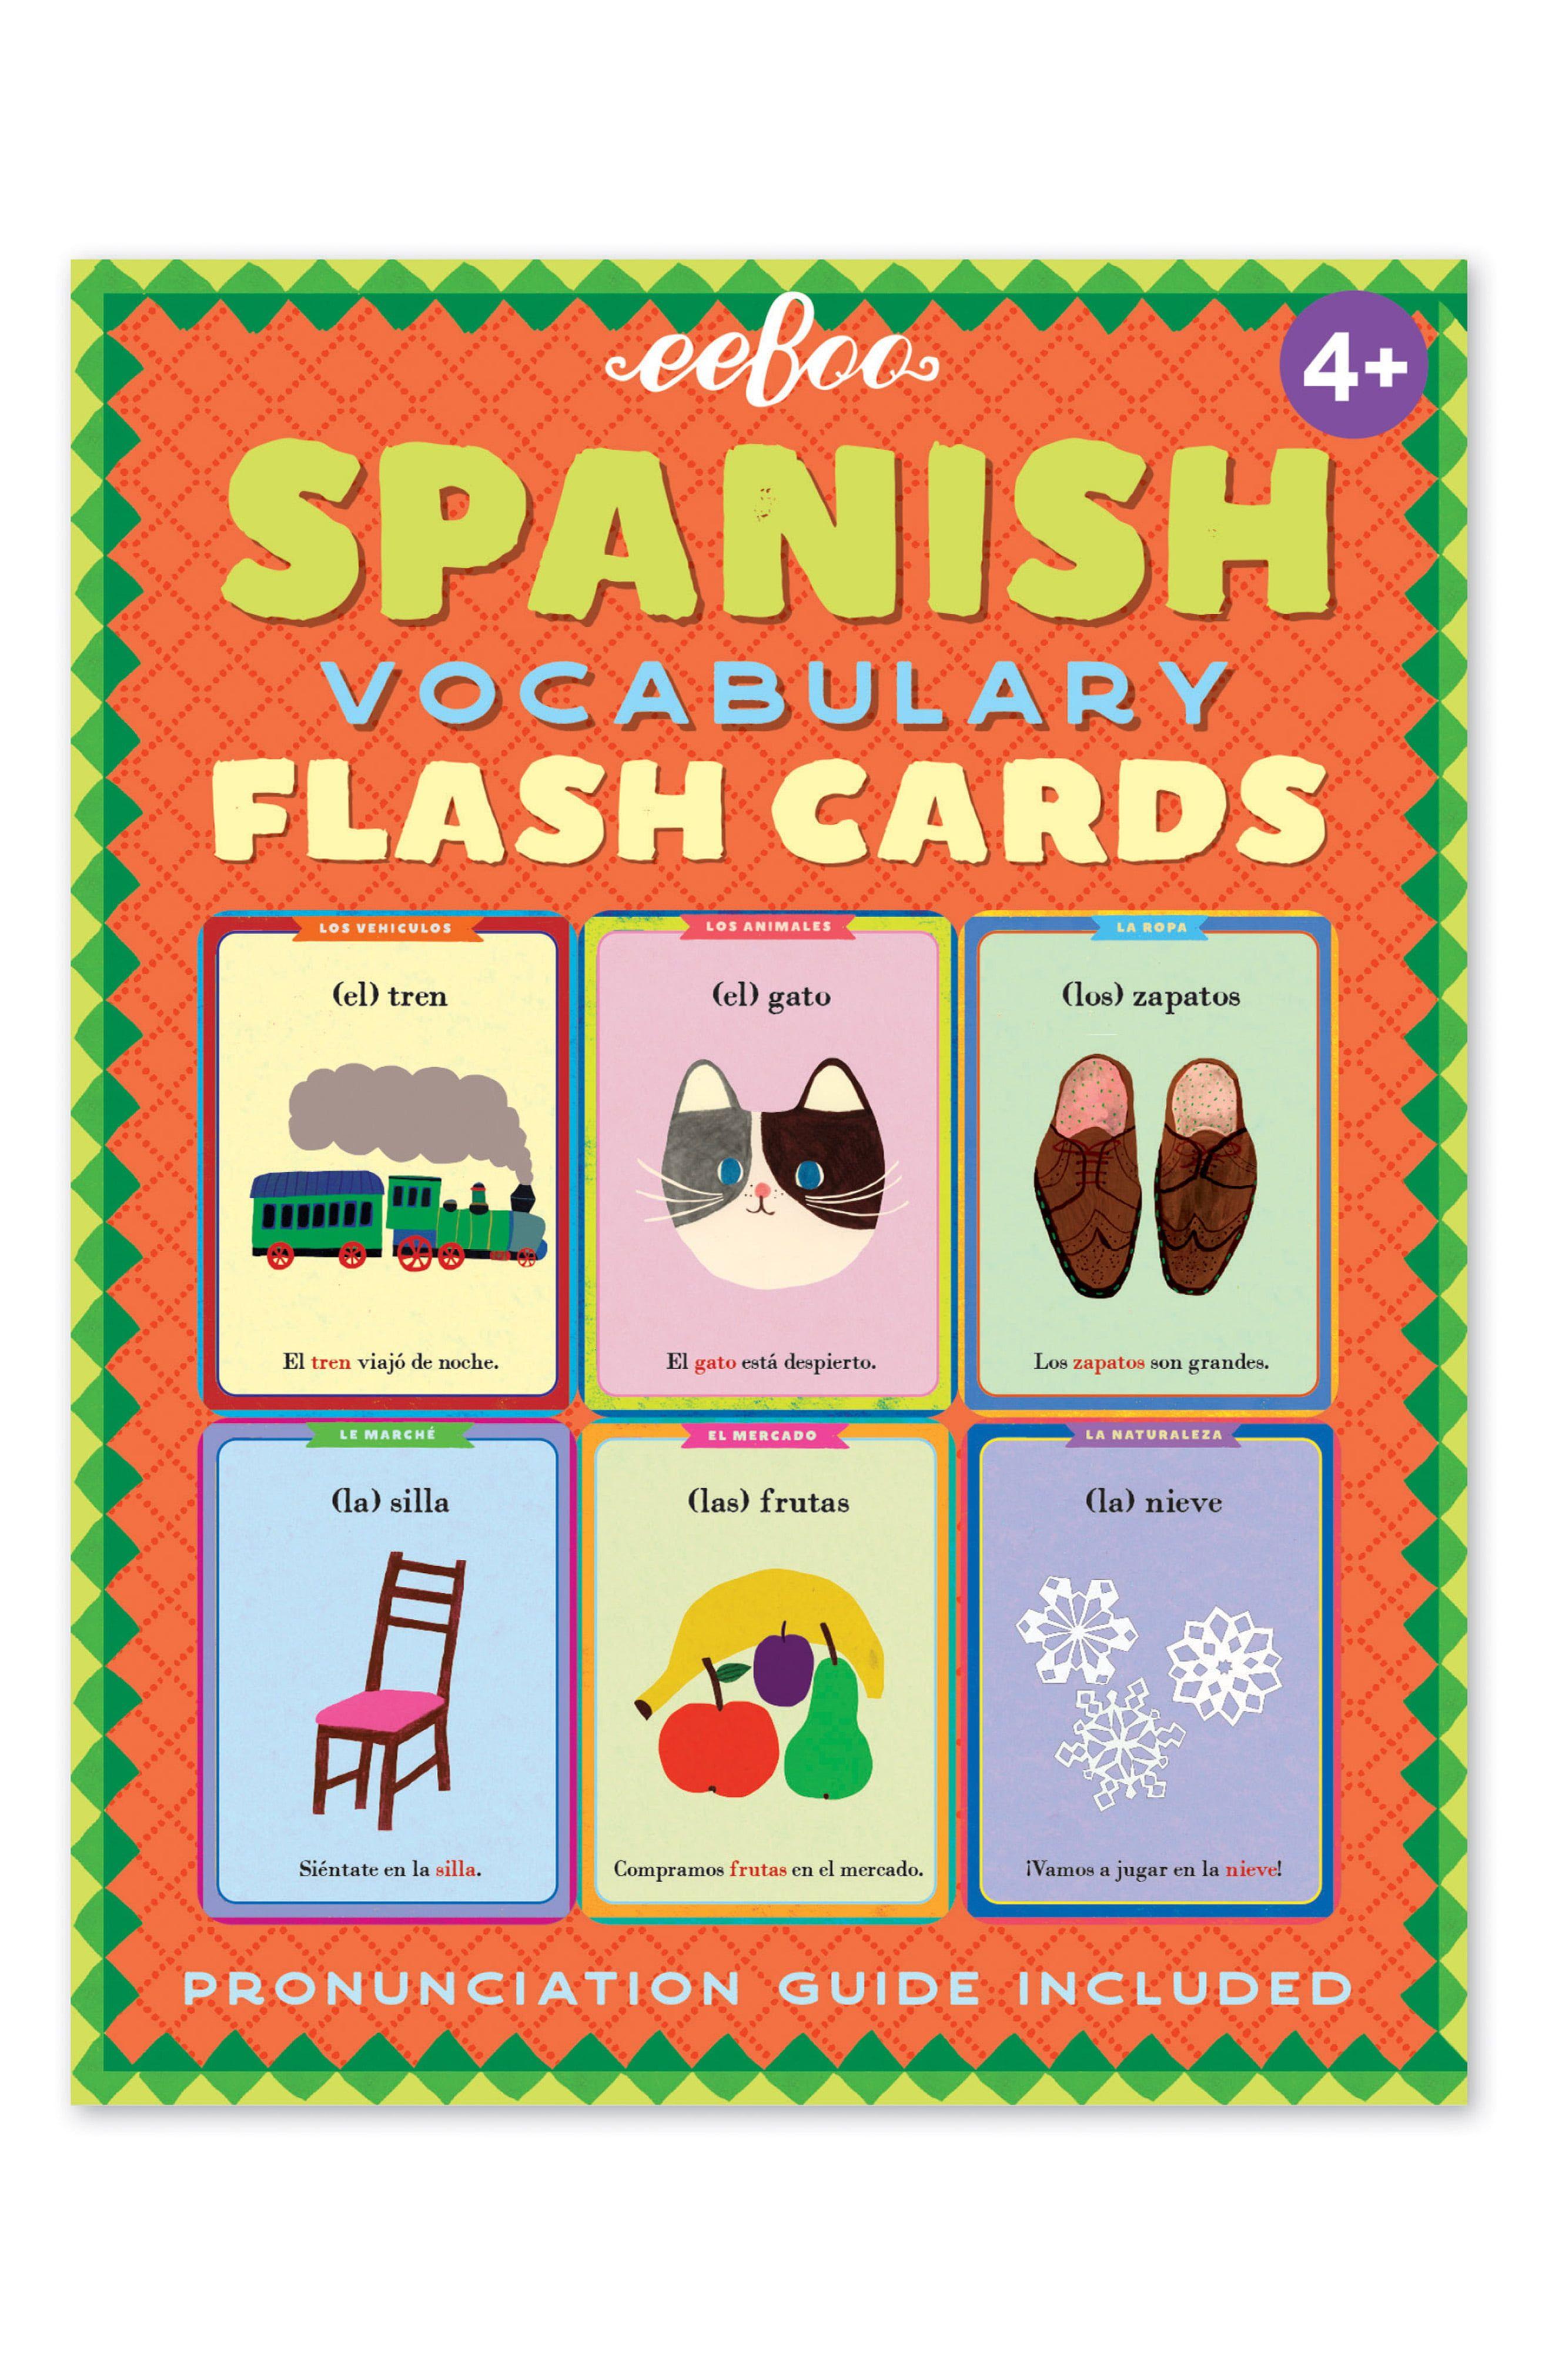 Eeboo Spanish Flash Cards Nordstrom In 2021 Vocabulary Flash Cards Flashcards Spanish Vocabulary